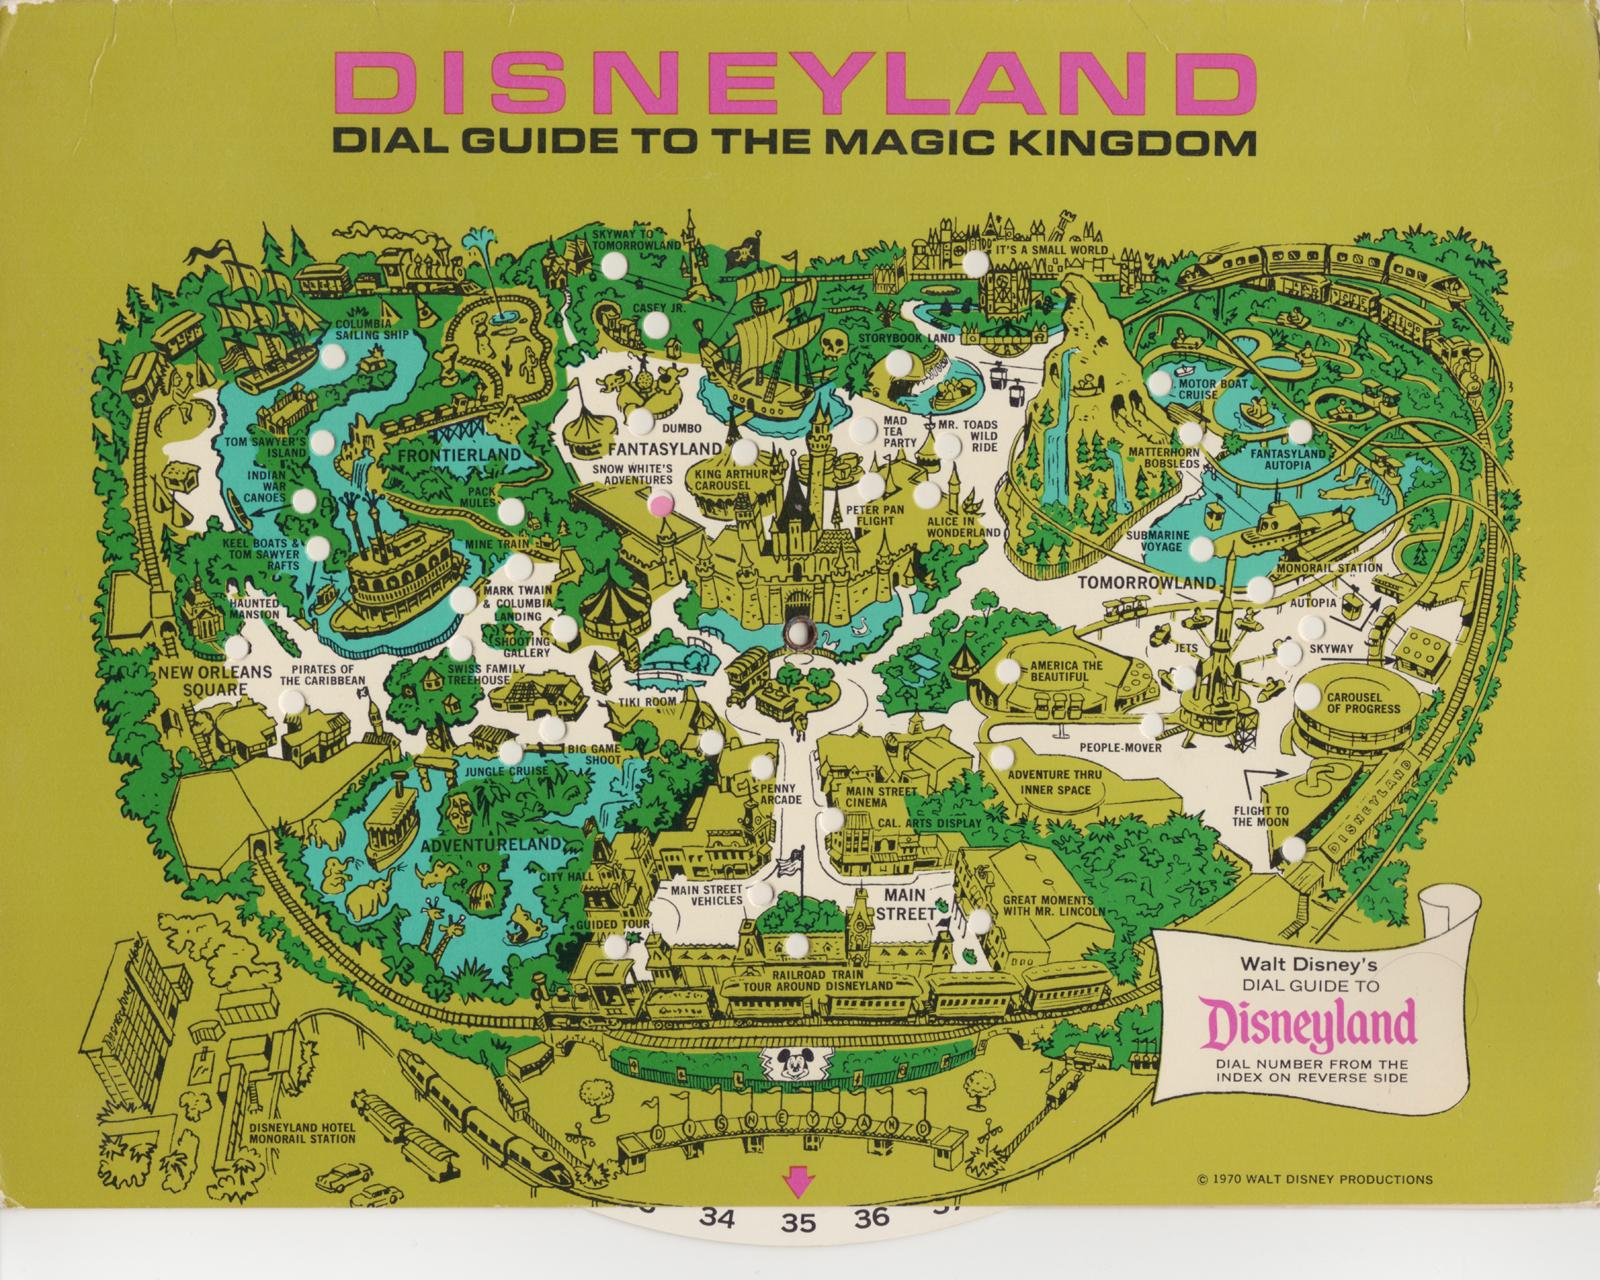 Filmic Light Snow White Archive Disneyland Dial Guide To - Disneyland brazil map